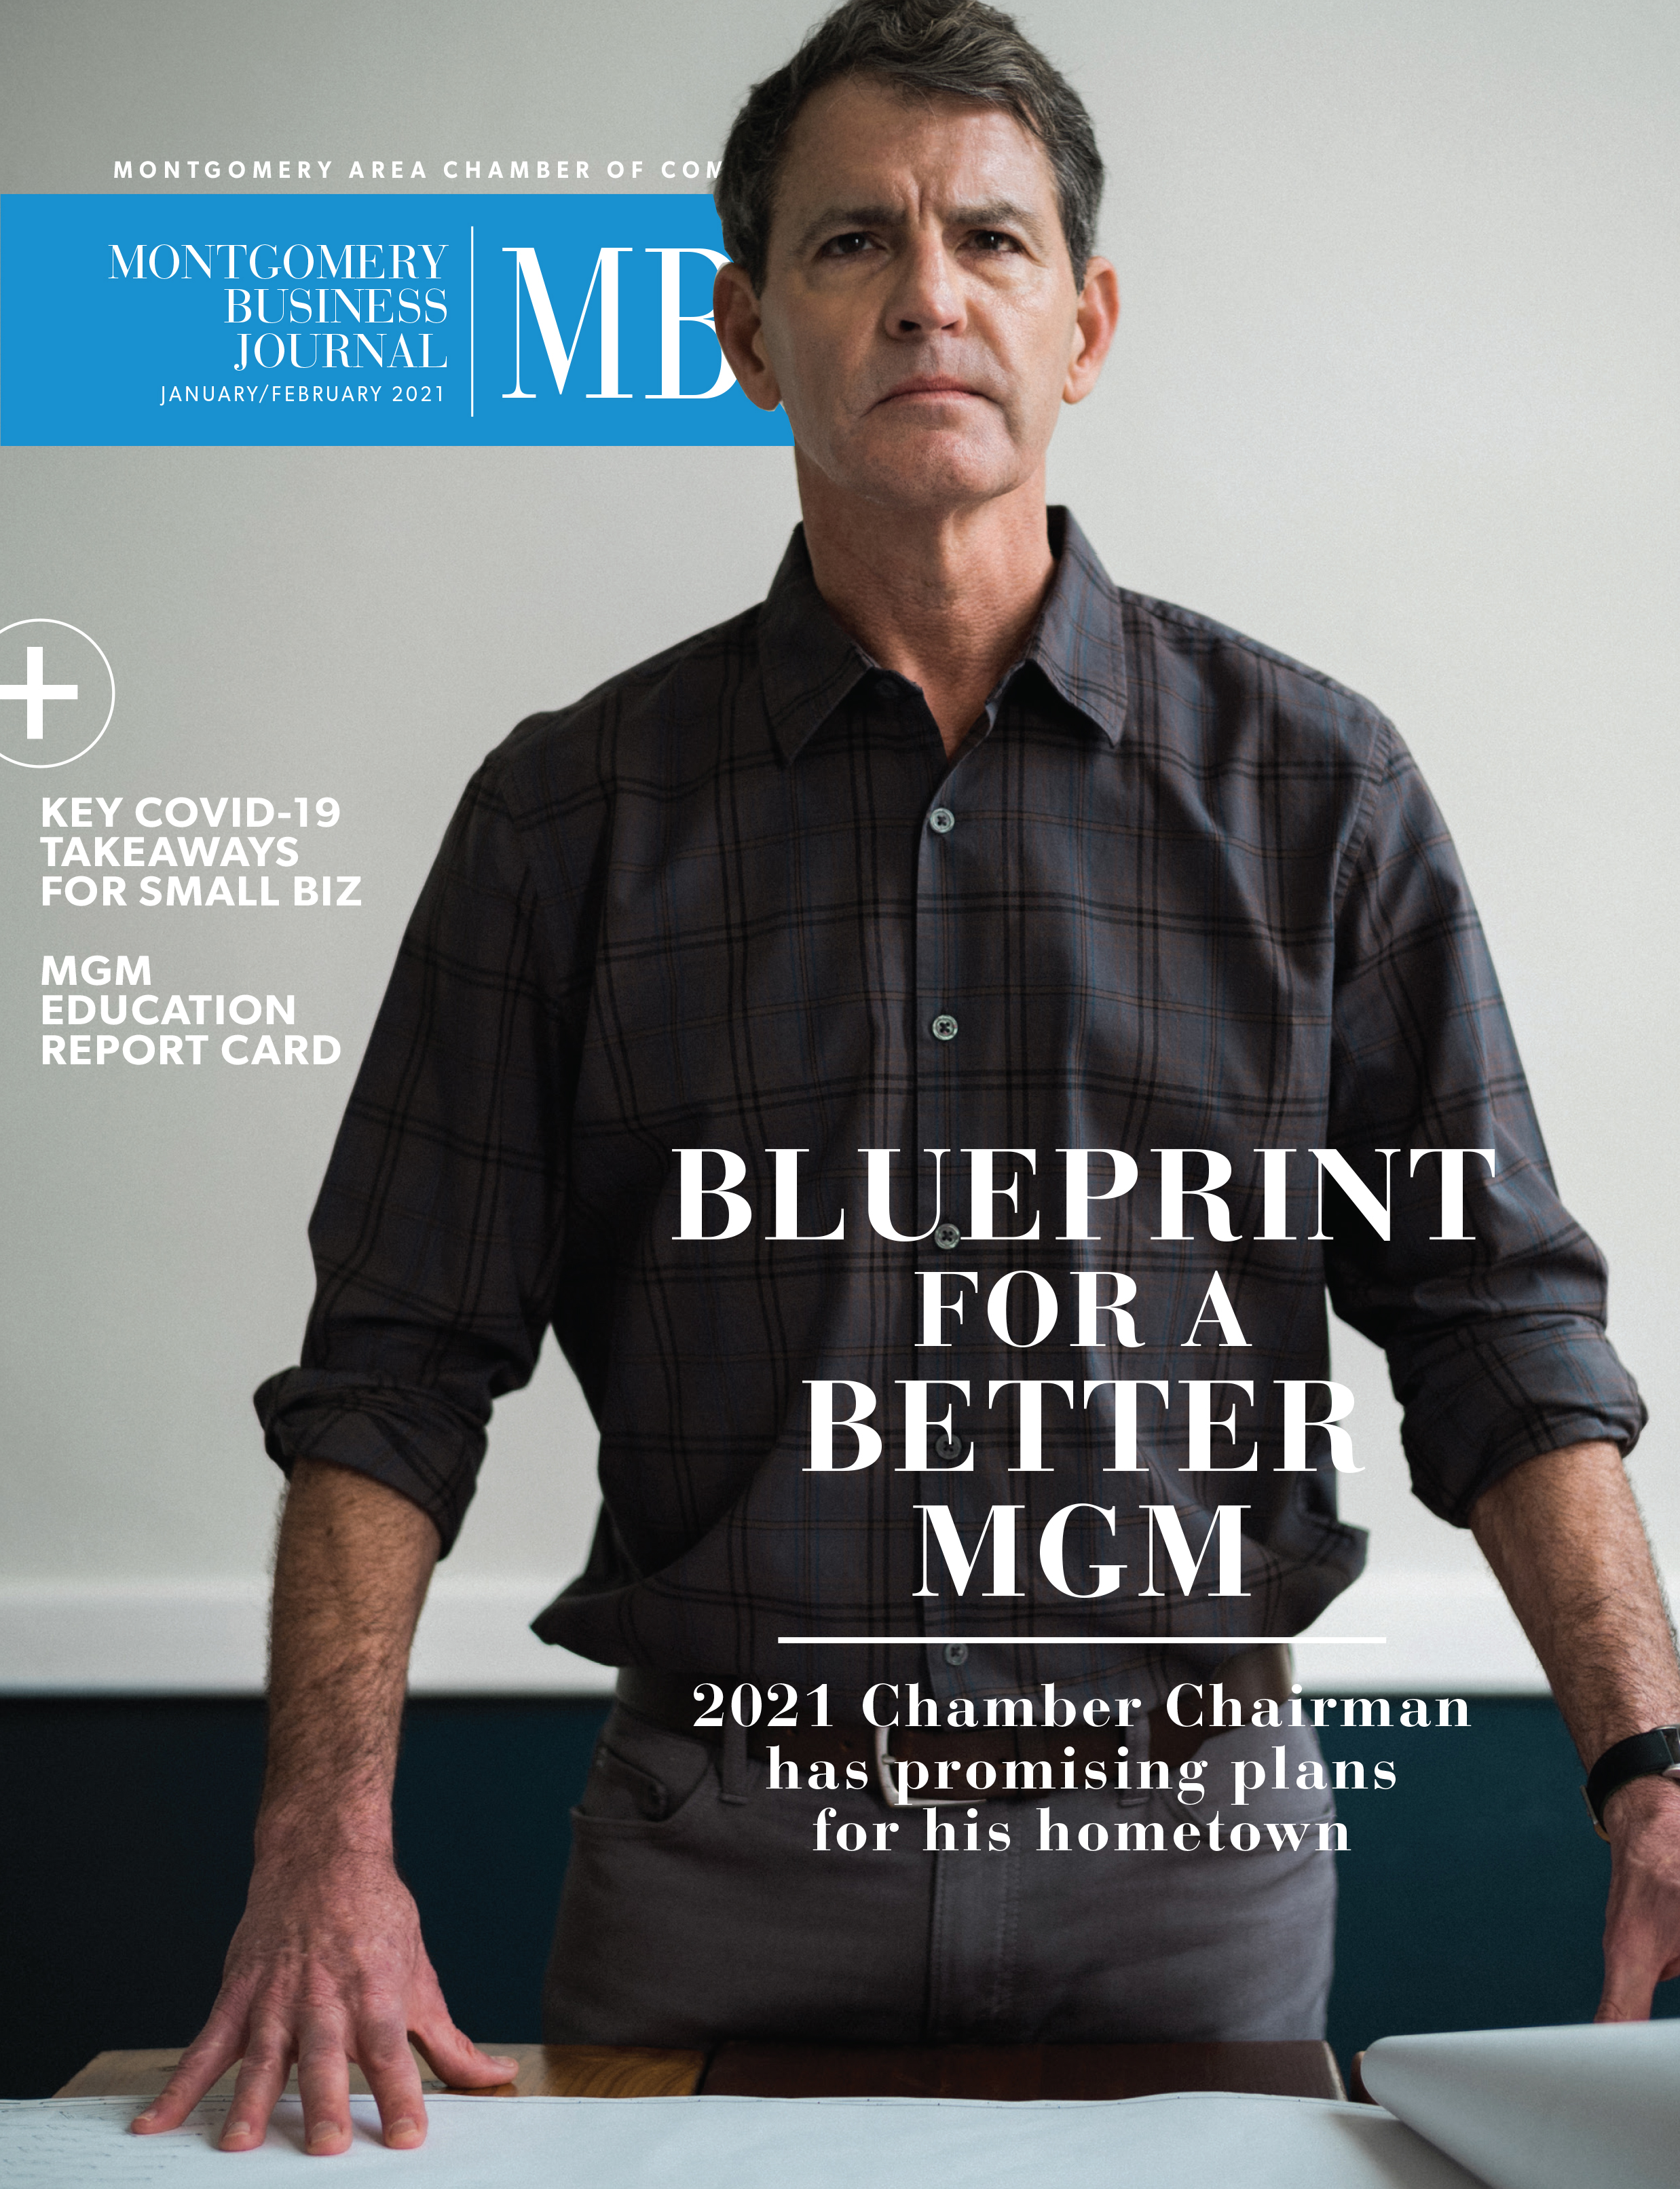 Montgomery Business Journal, MBJ. January 2021, Montgomery Chamber